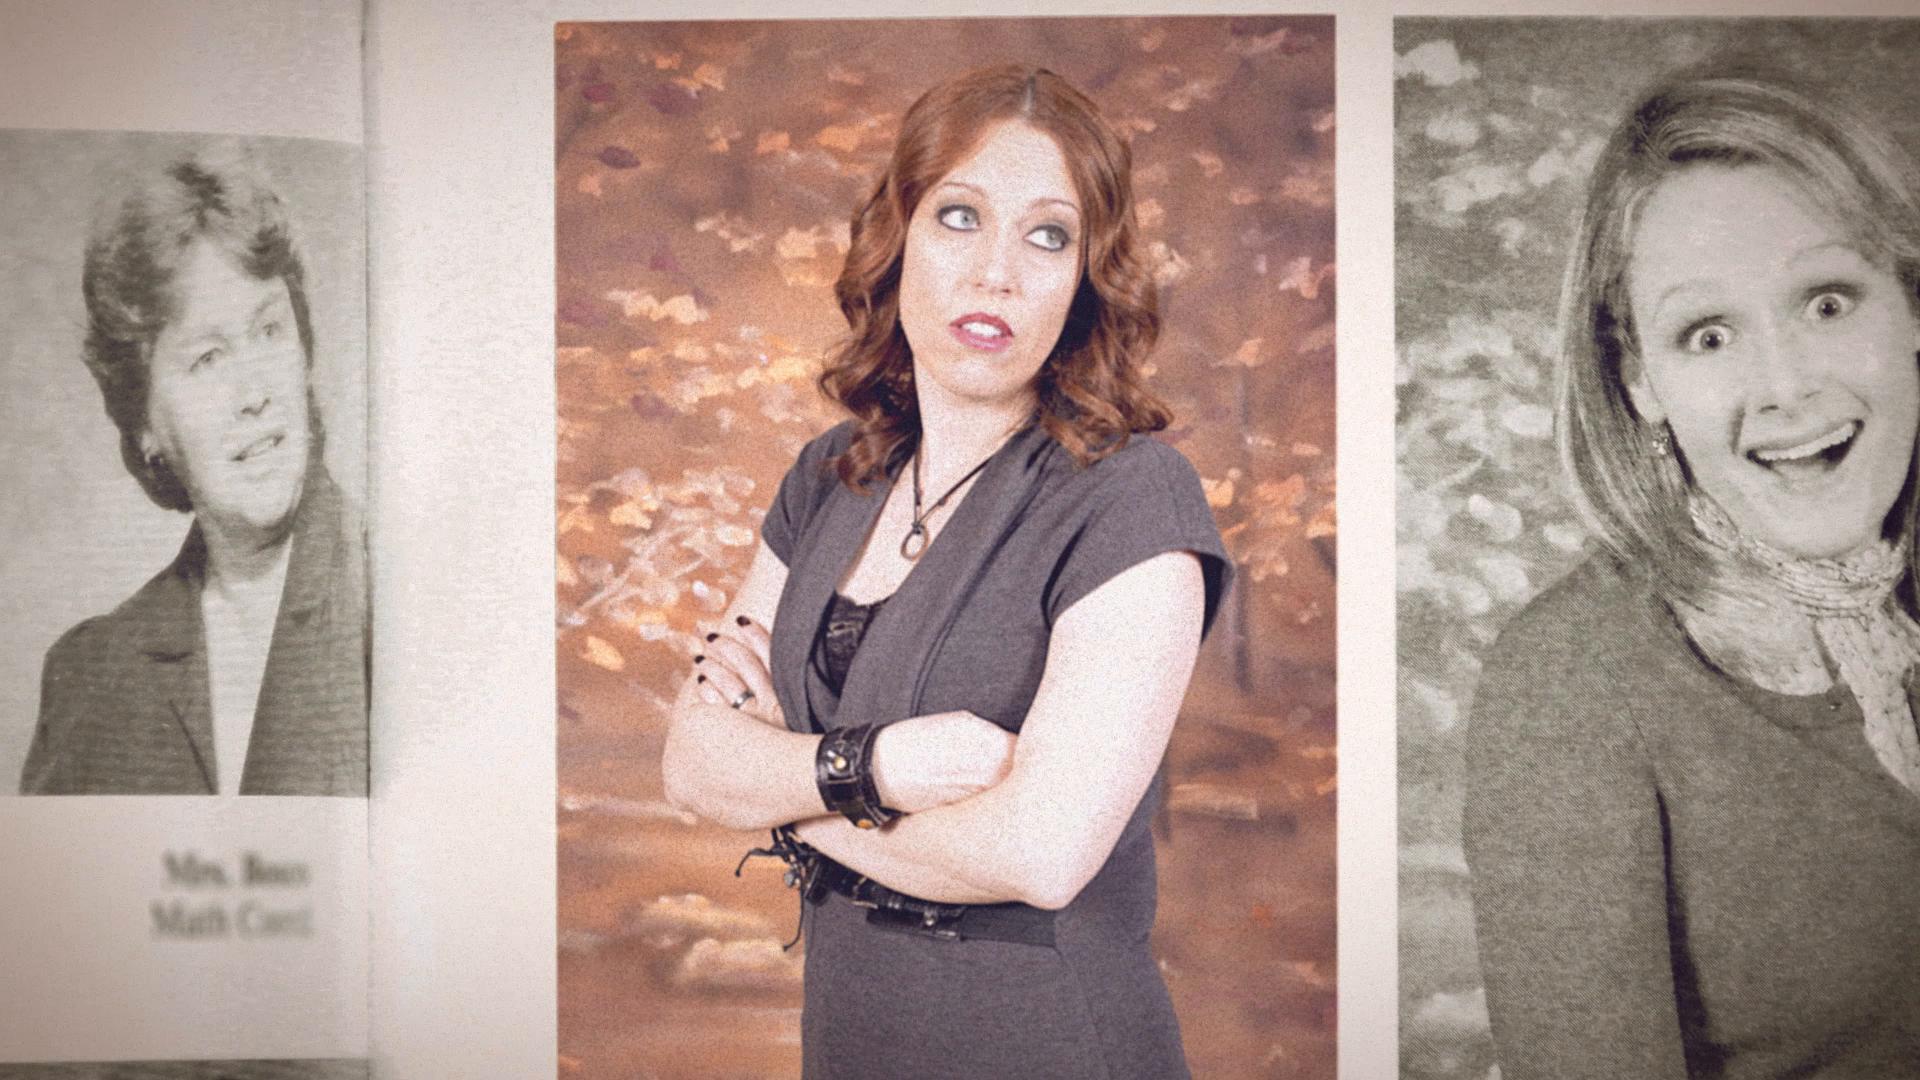 Thumbnail for Yearbook Portrait: Adler